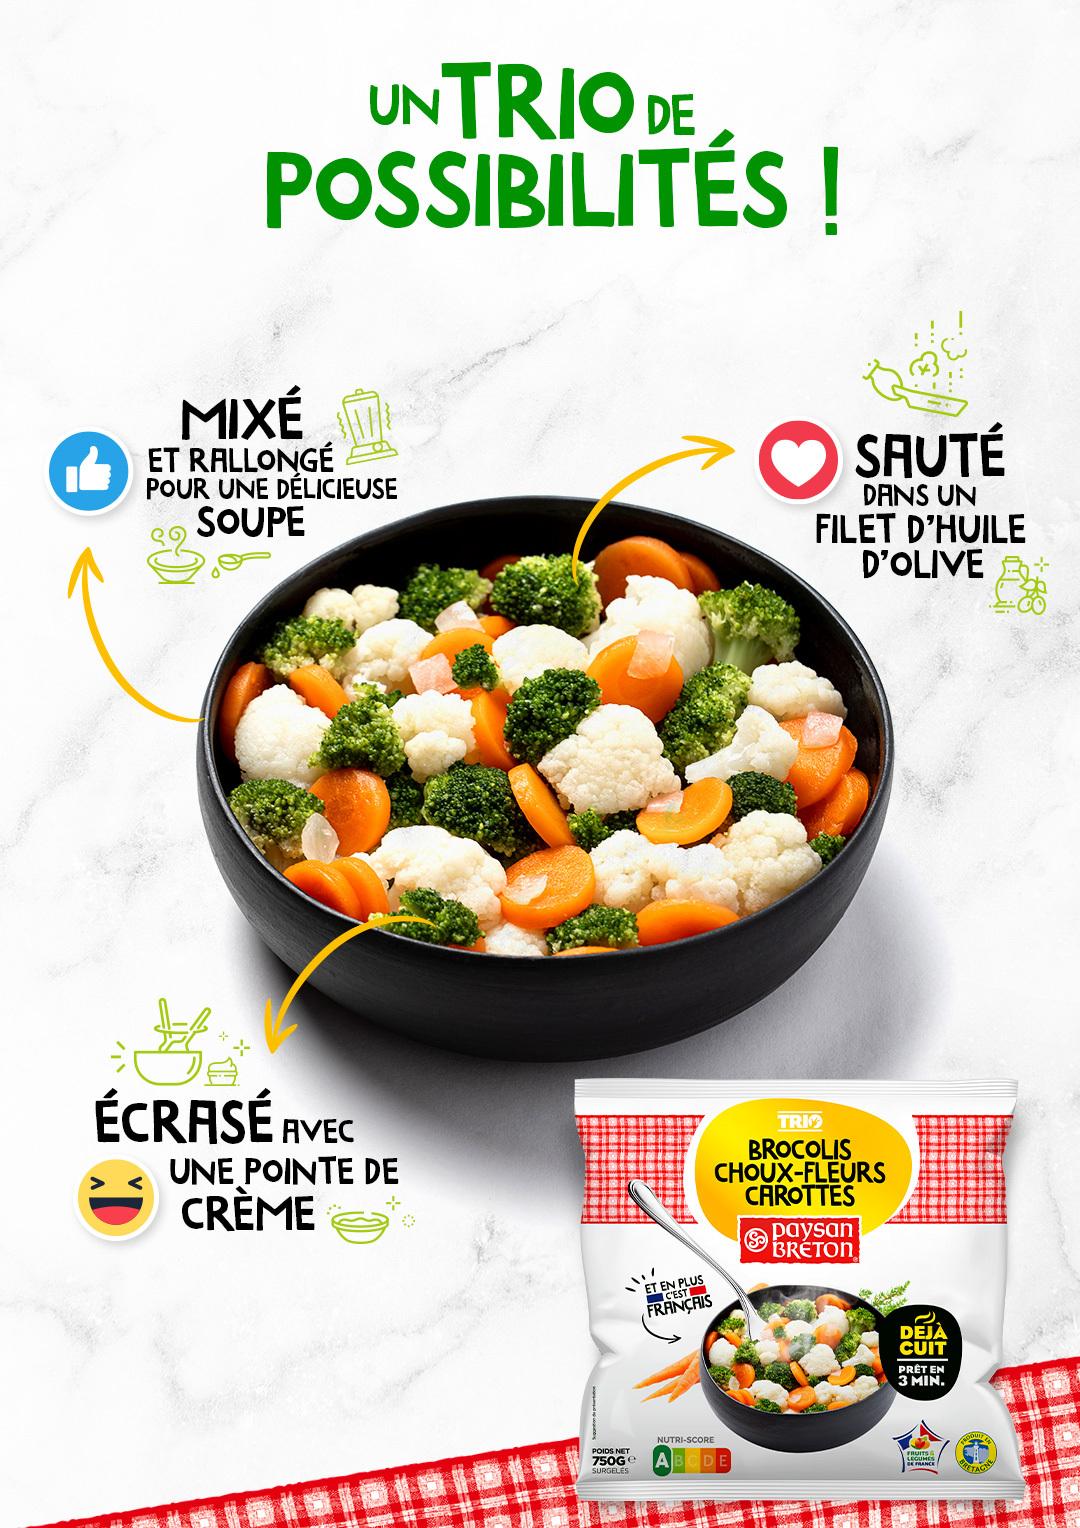 PB Trio v2 - Paysan Breton renforce sa gamme de légumes surgelés déjà cuits